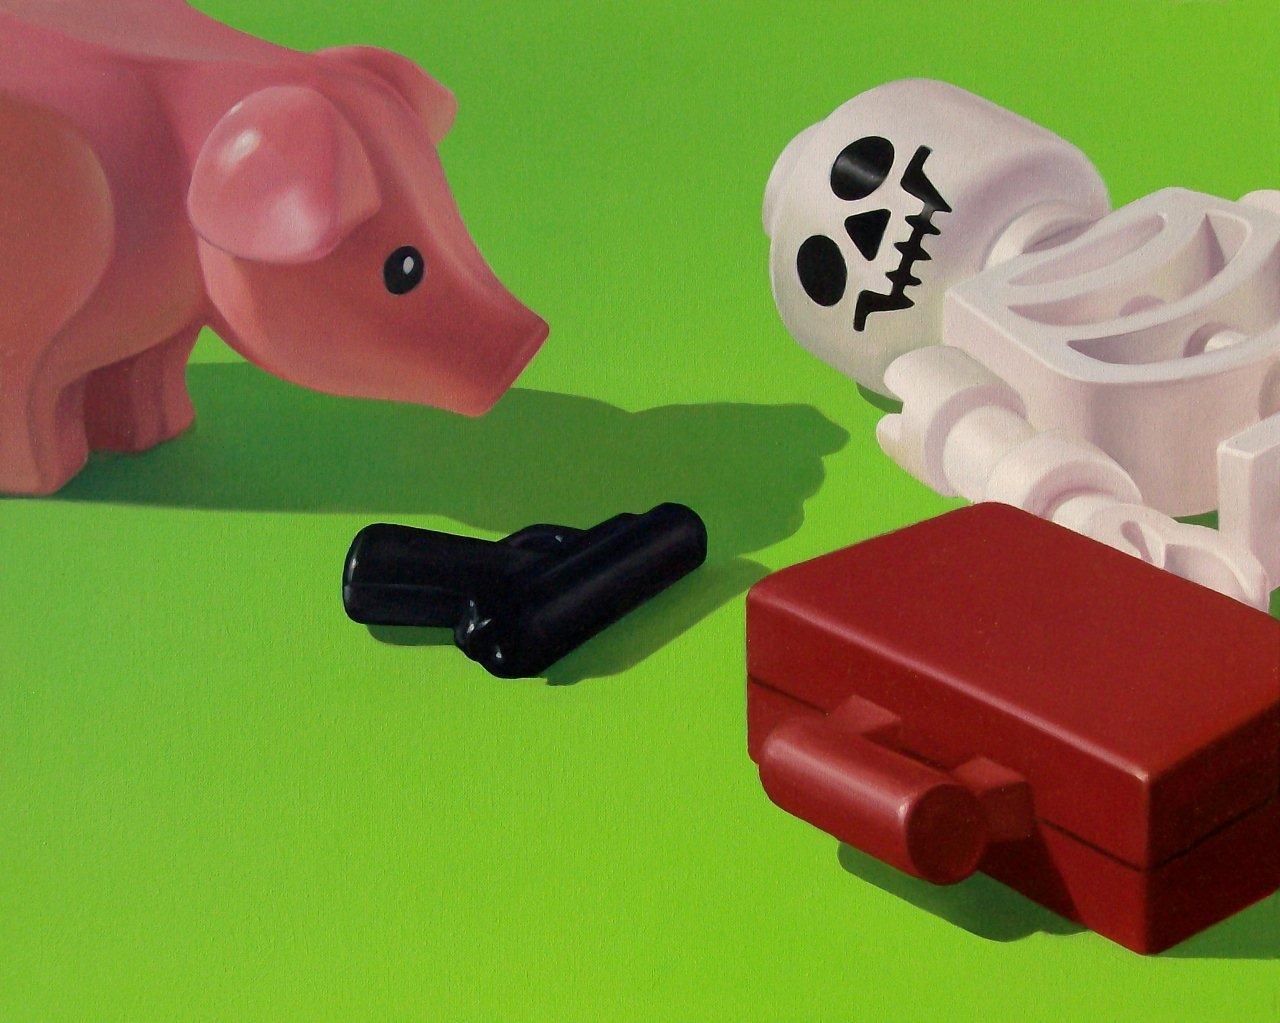 Stefano Bolcato, Pigs Story, olio su tela, cm 50x60